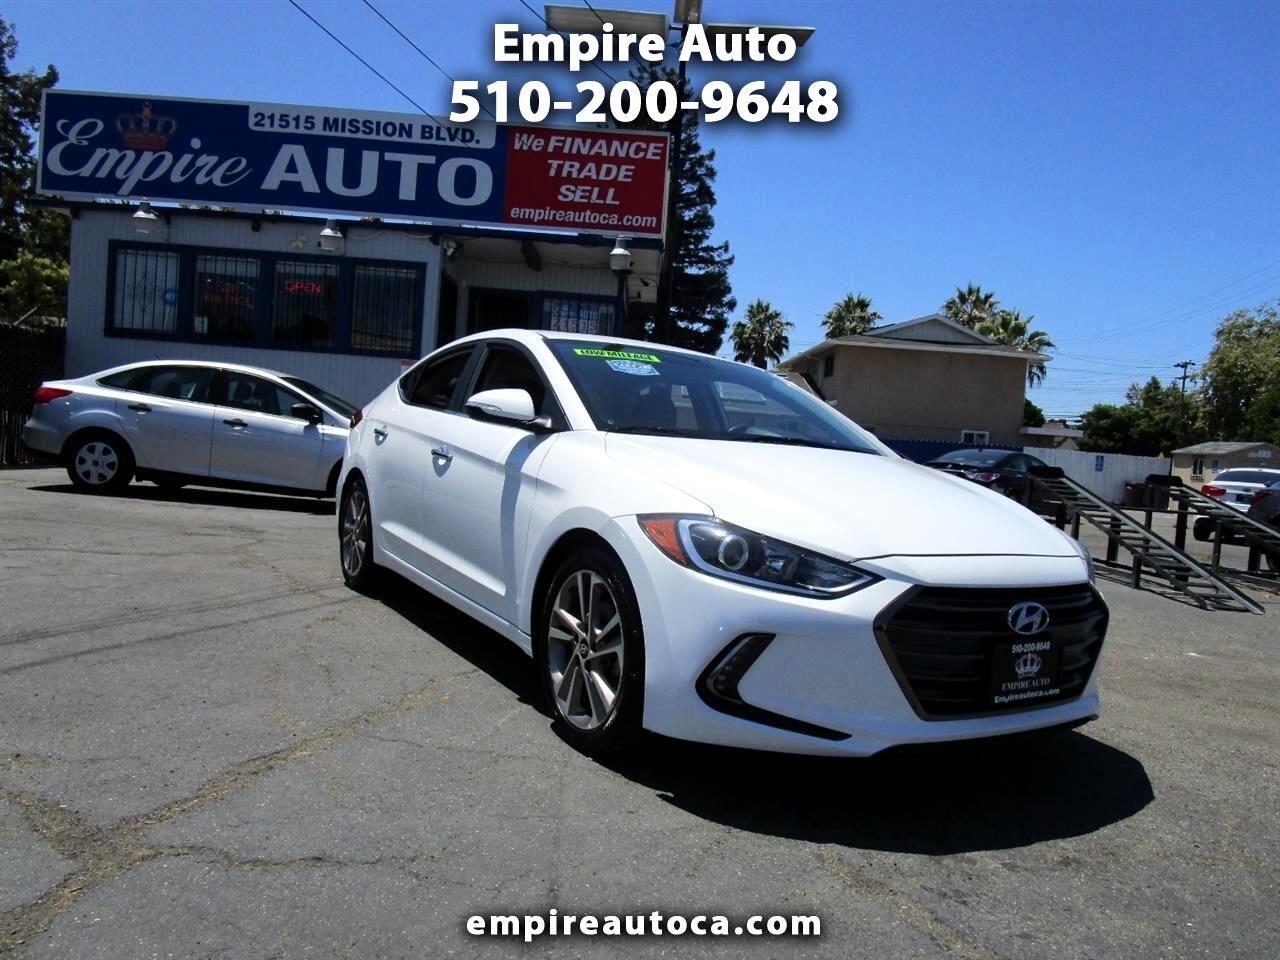 2017 Hyundai Elantra Hayward CA